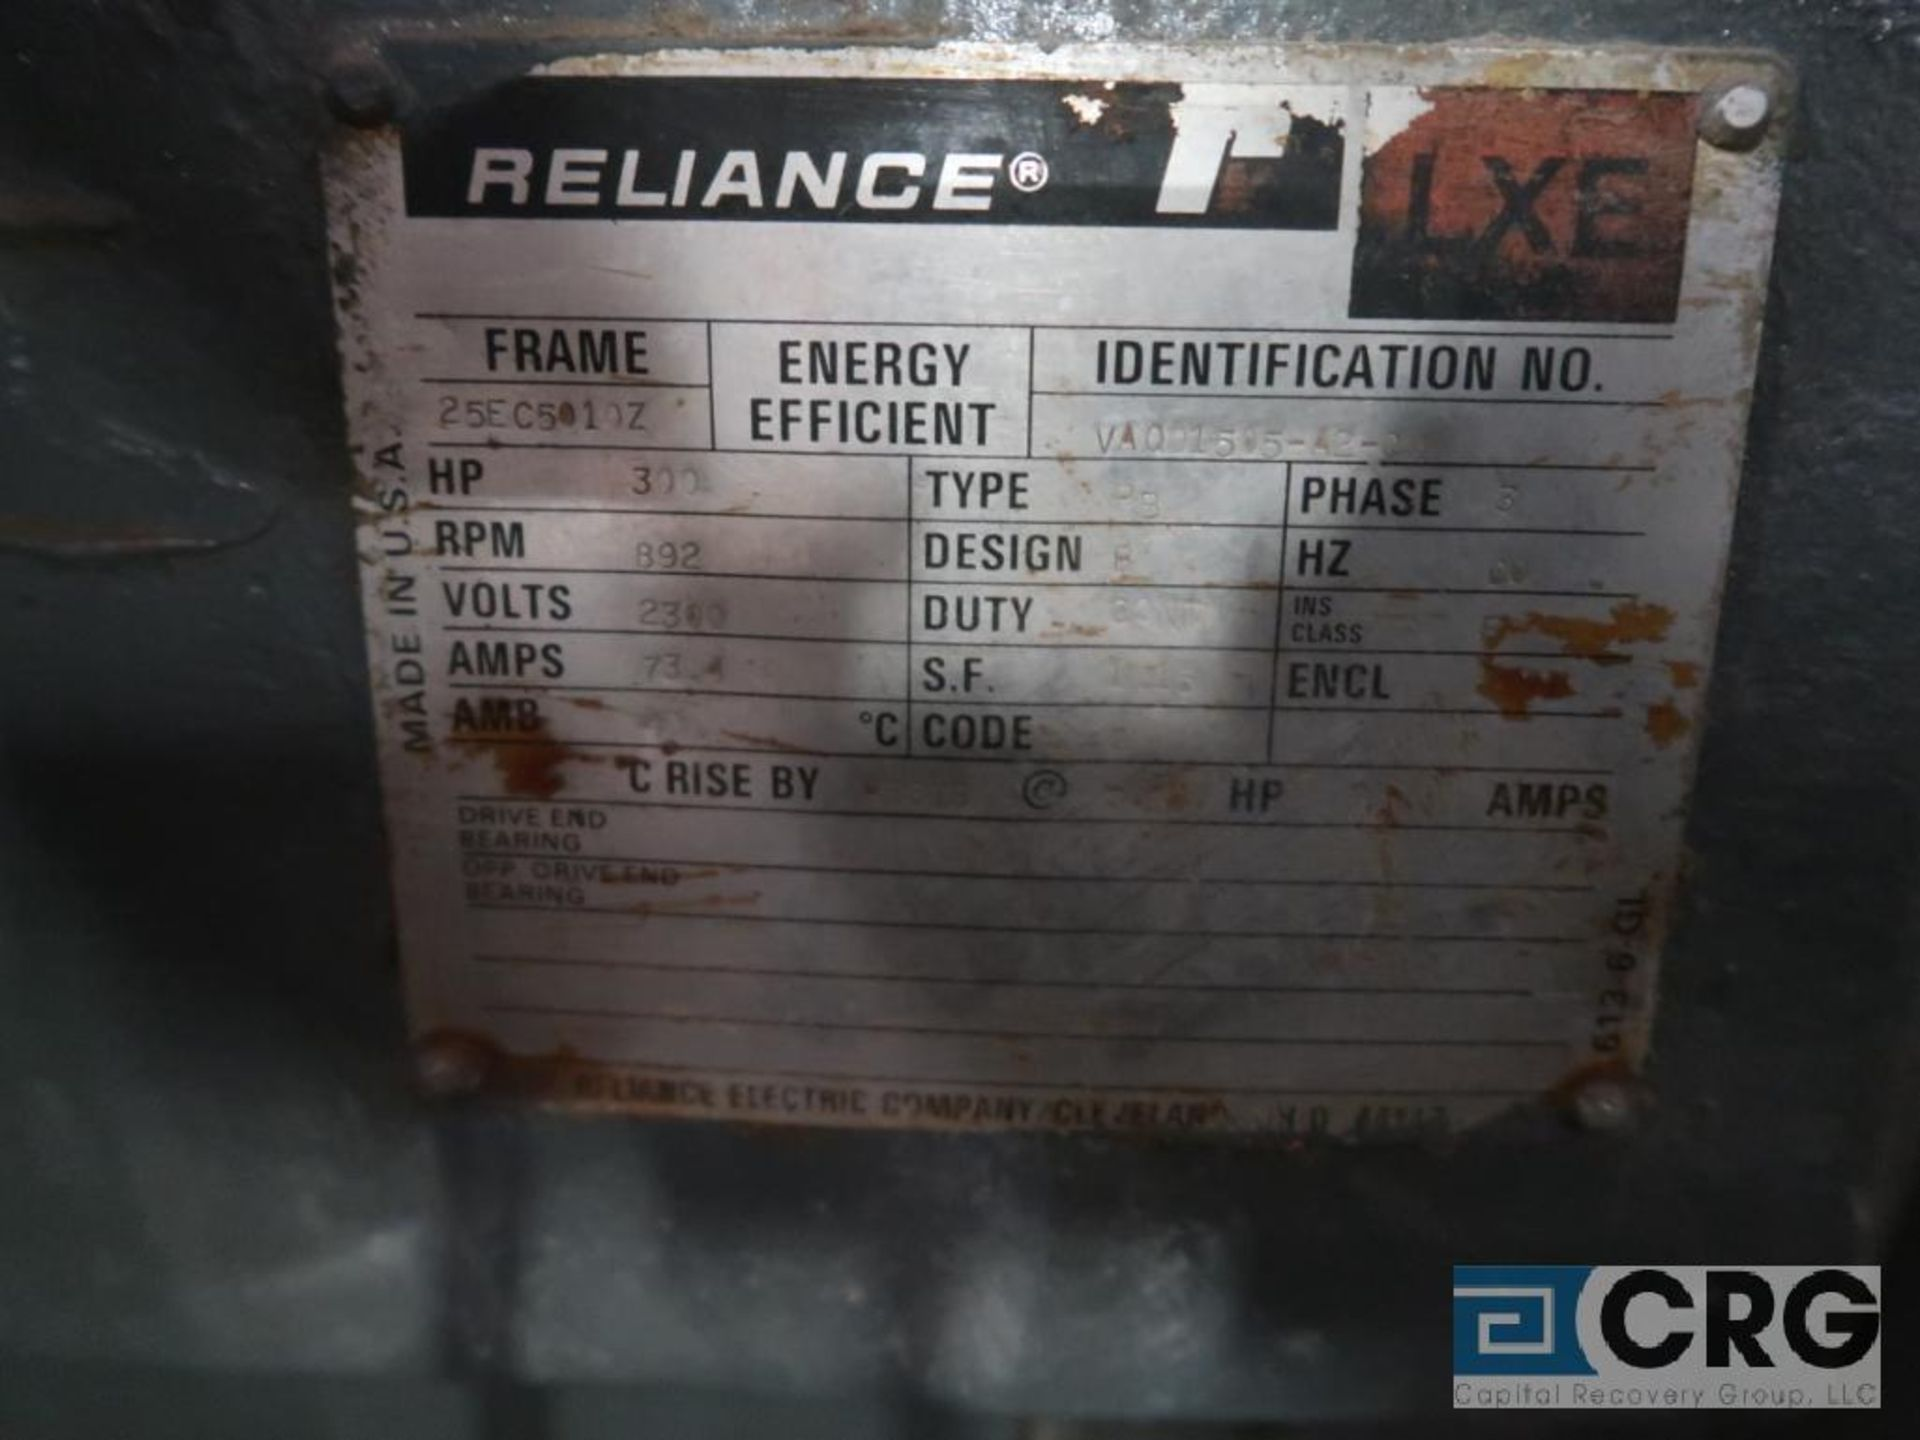 Reliance motor, 300 HP, 892 RPM, 2,300 volt, frame 255010Z, equipment #E00428 (496 Dock Area) - Image 2 of 2